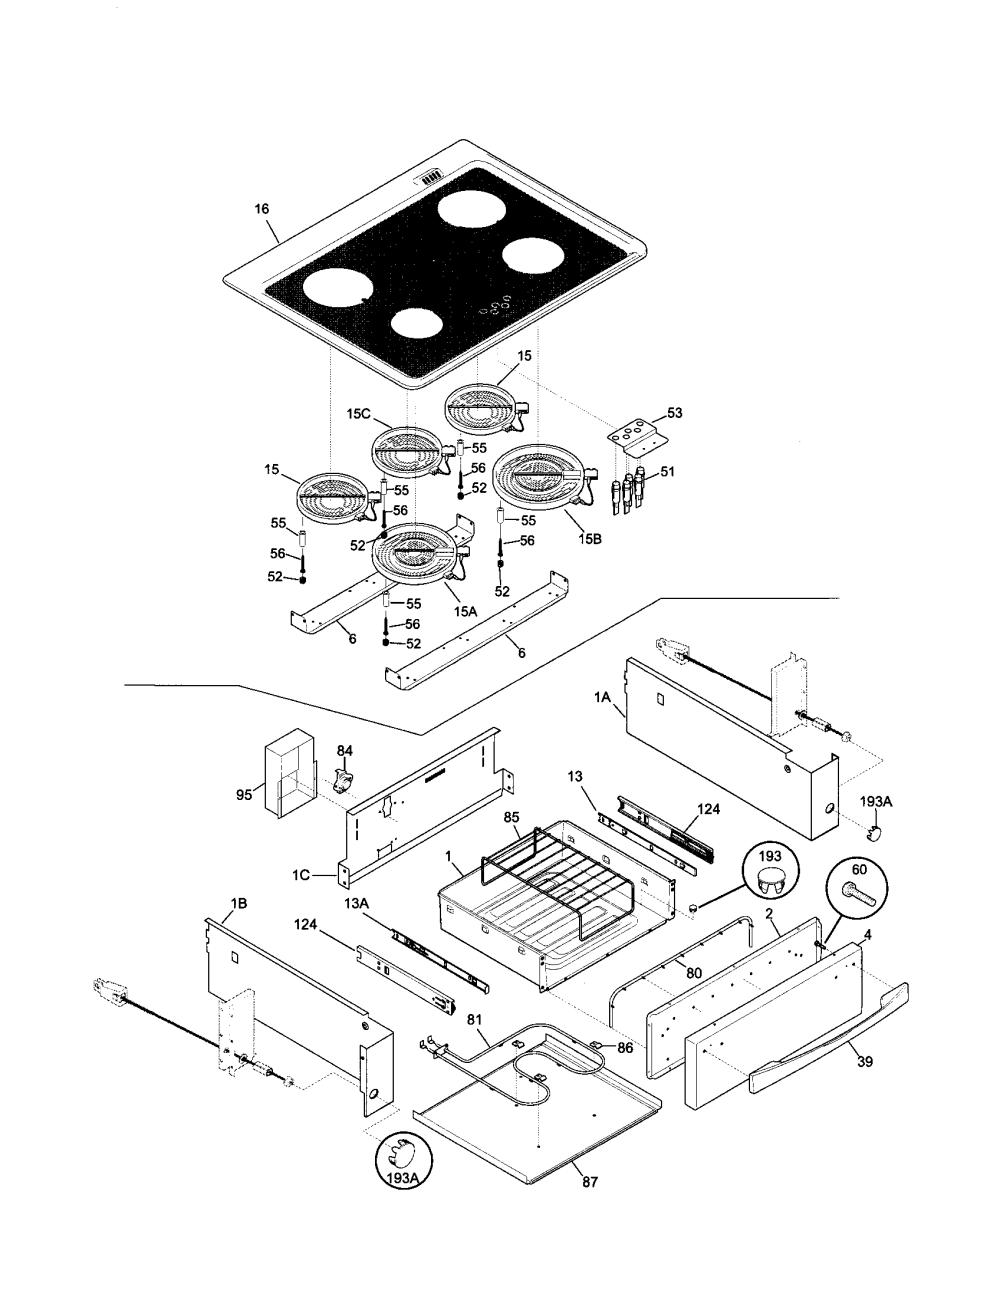 medium resolution of kenmore 790 electric range wiring diagram wiring diagram database kenmore 790 electric range wiring diagram